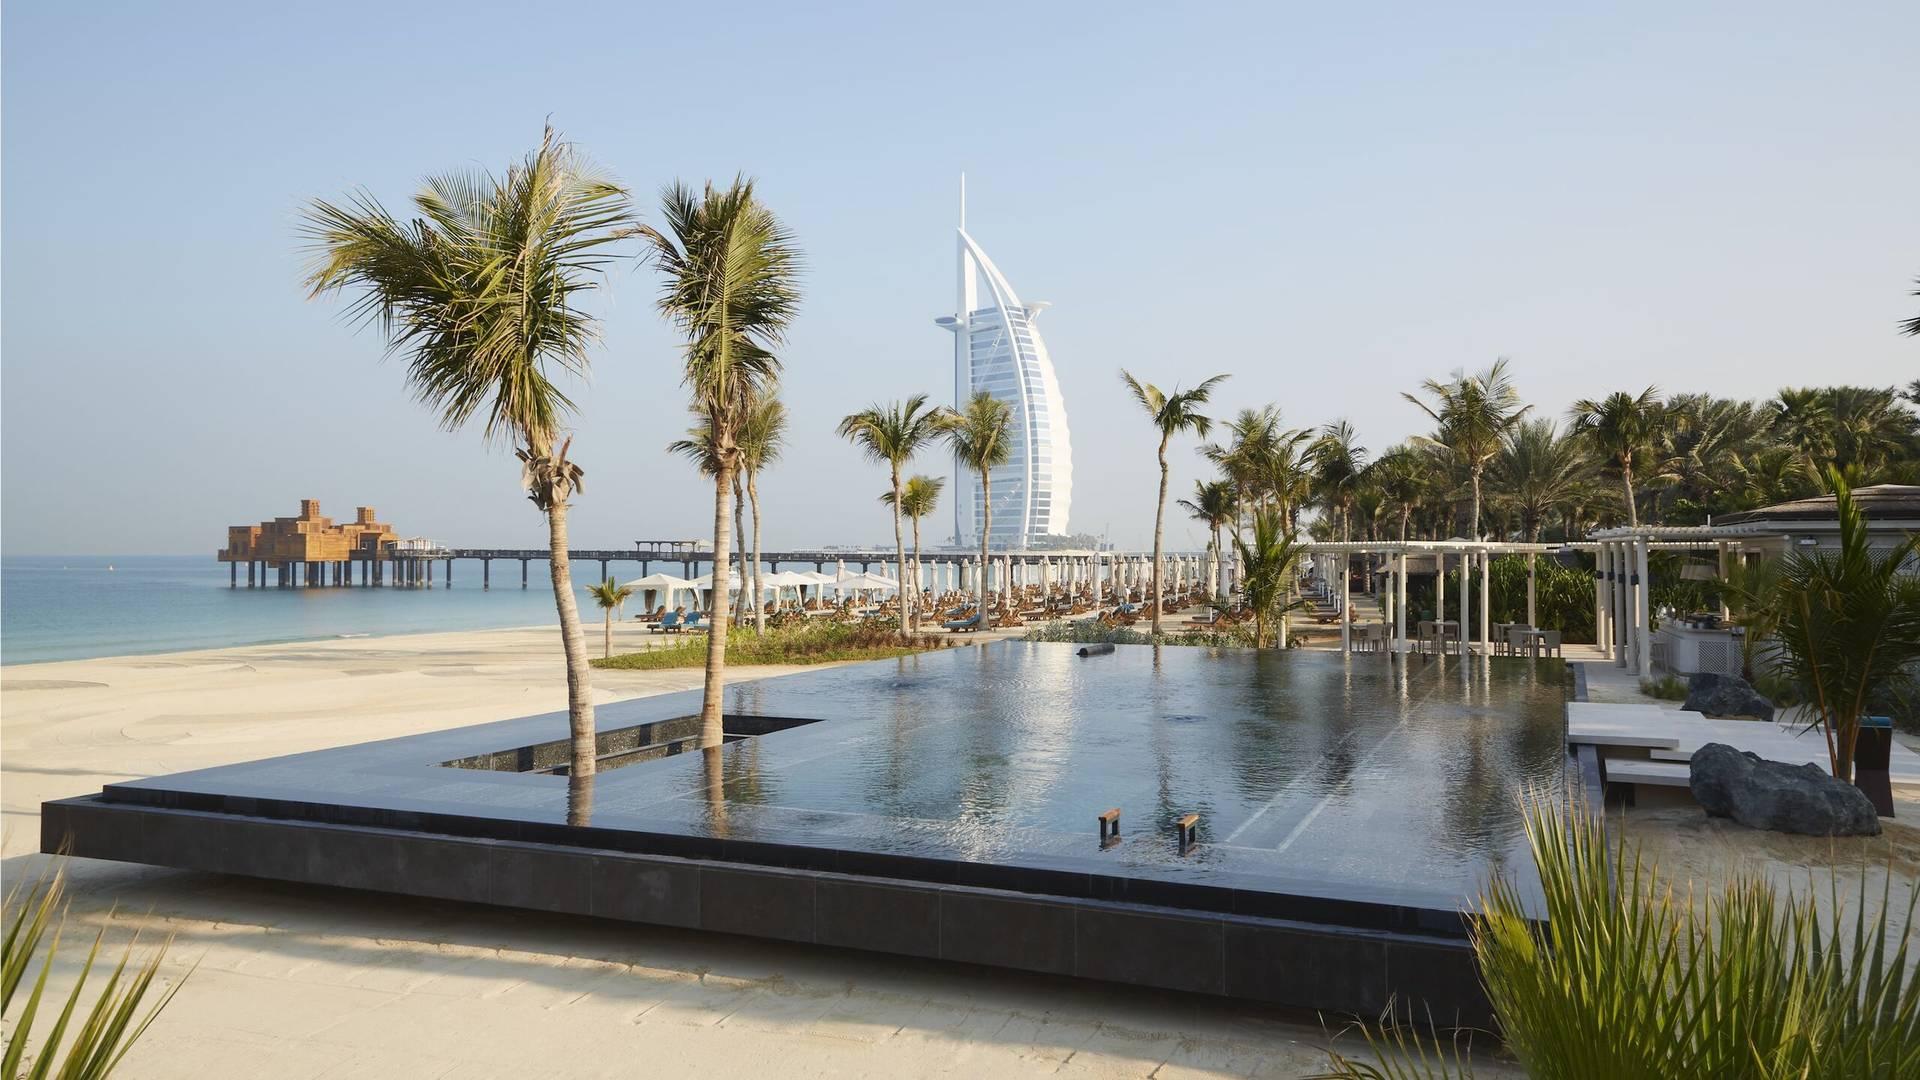 Jumeirah Dar Al Masyaf's Celeste infinity pool